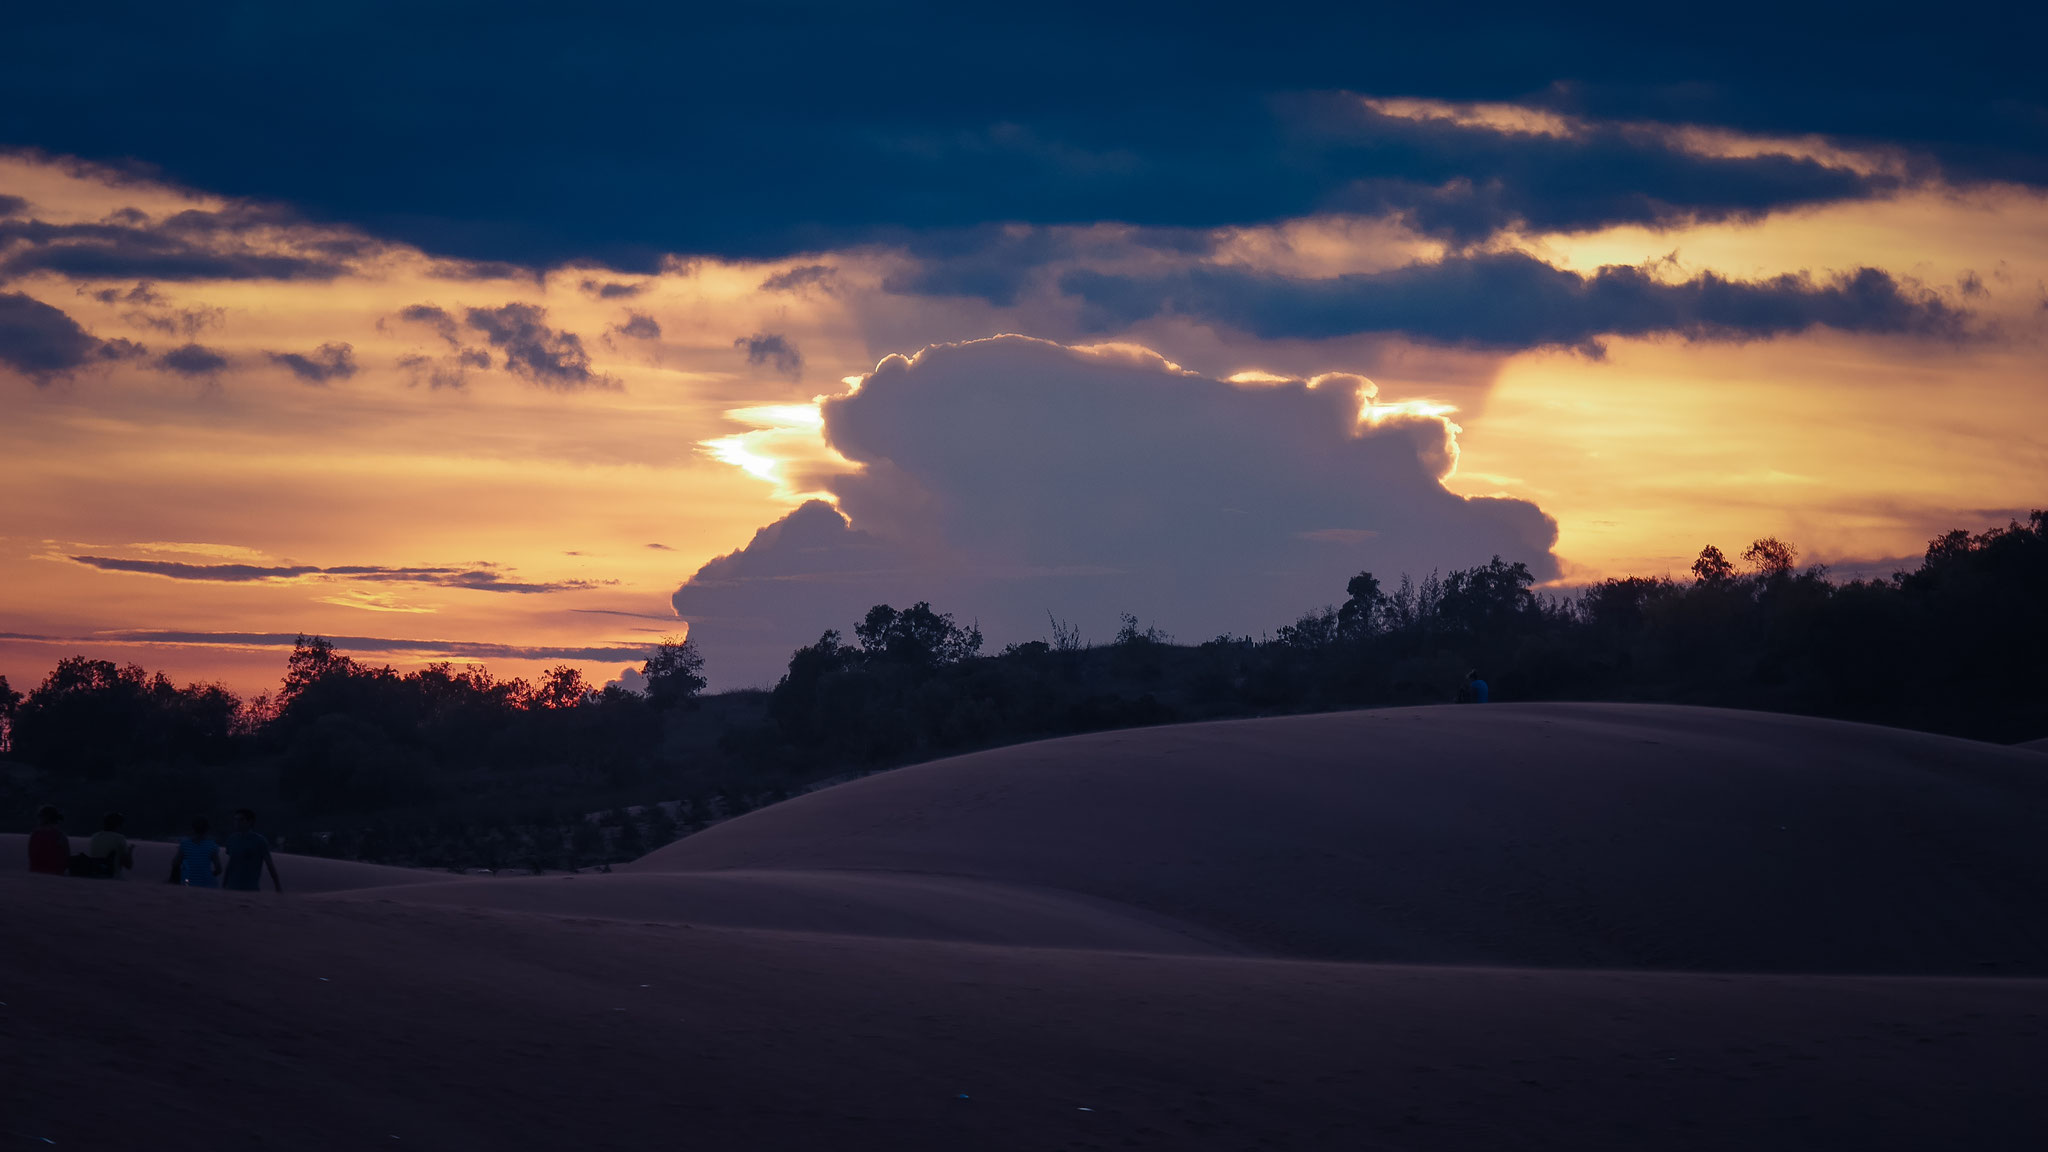 Phan Tiet (Mui Ne) - Red Sand Dunes